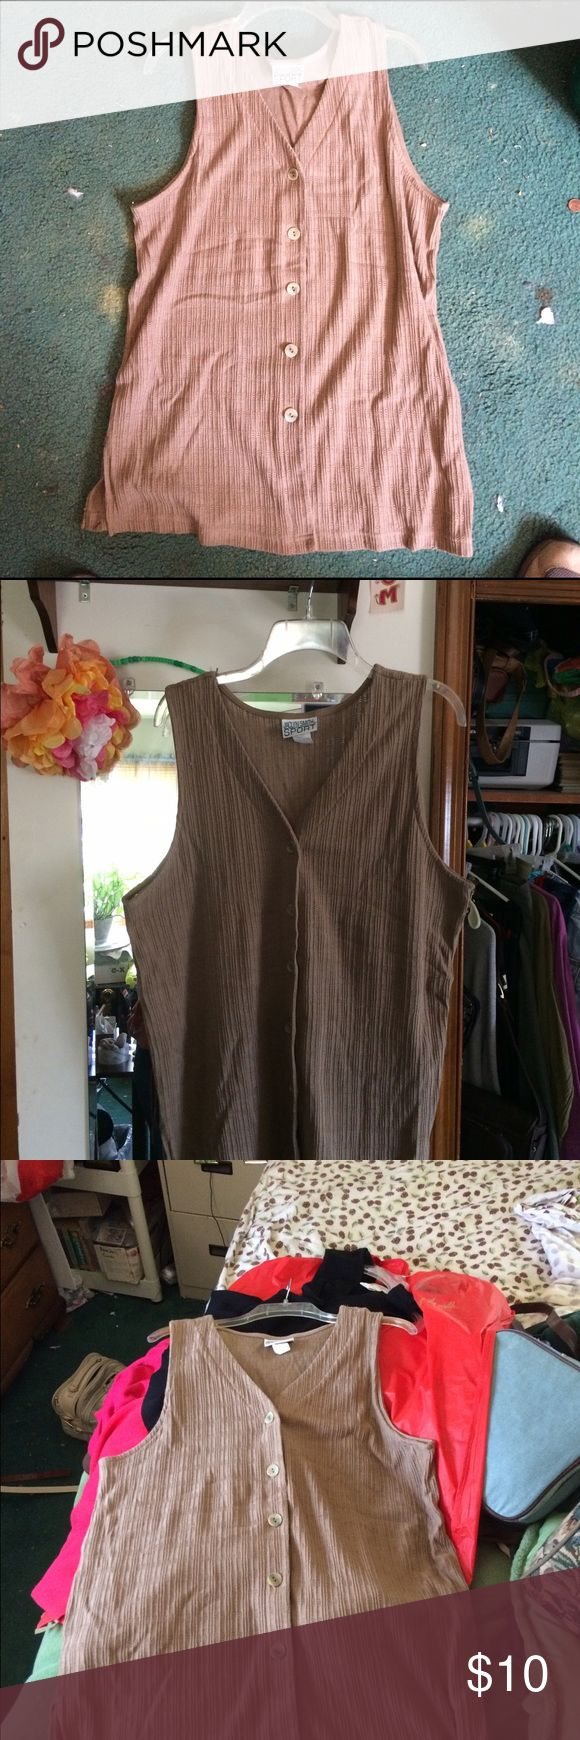 Jaclyn Smith Sz Lg Beige Vest/Shirt Jaclyn Smith Sz Lg Beige Vest and/or Shirt. Great Condition! 50/50 Cotton Polyester Blend. Jaclyn Smith Tops